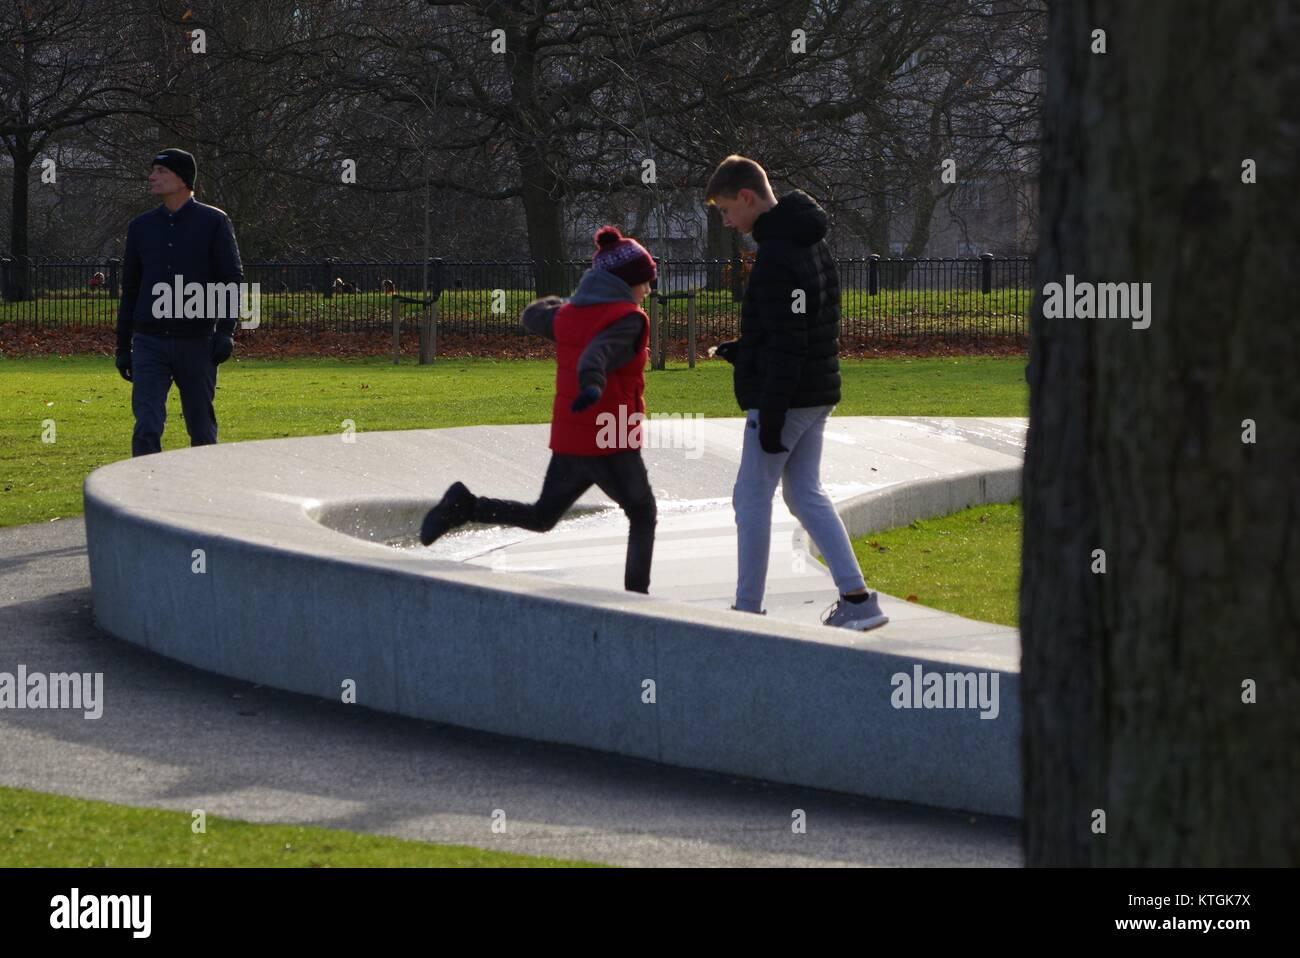 Princess Diana Memorial Fountain, Hyde Park, London, UK. December 2017. - Stock Image